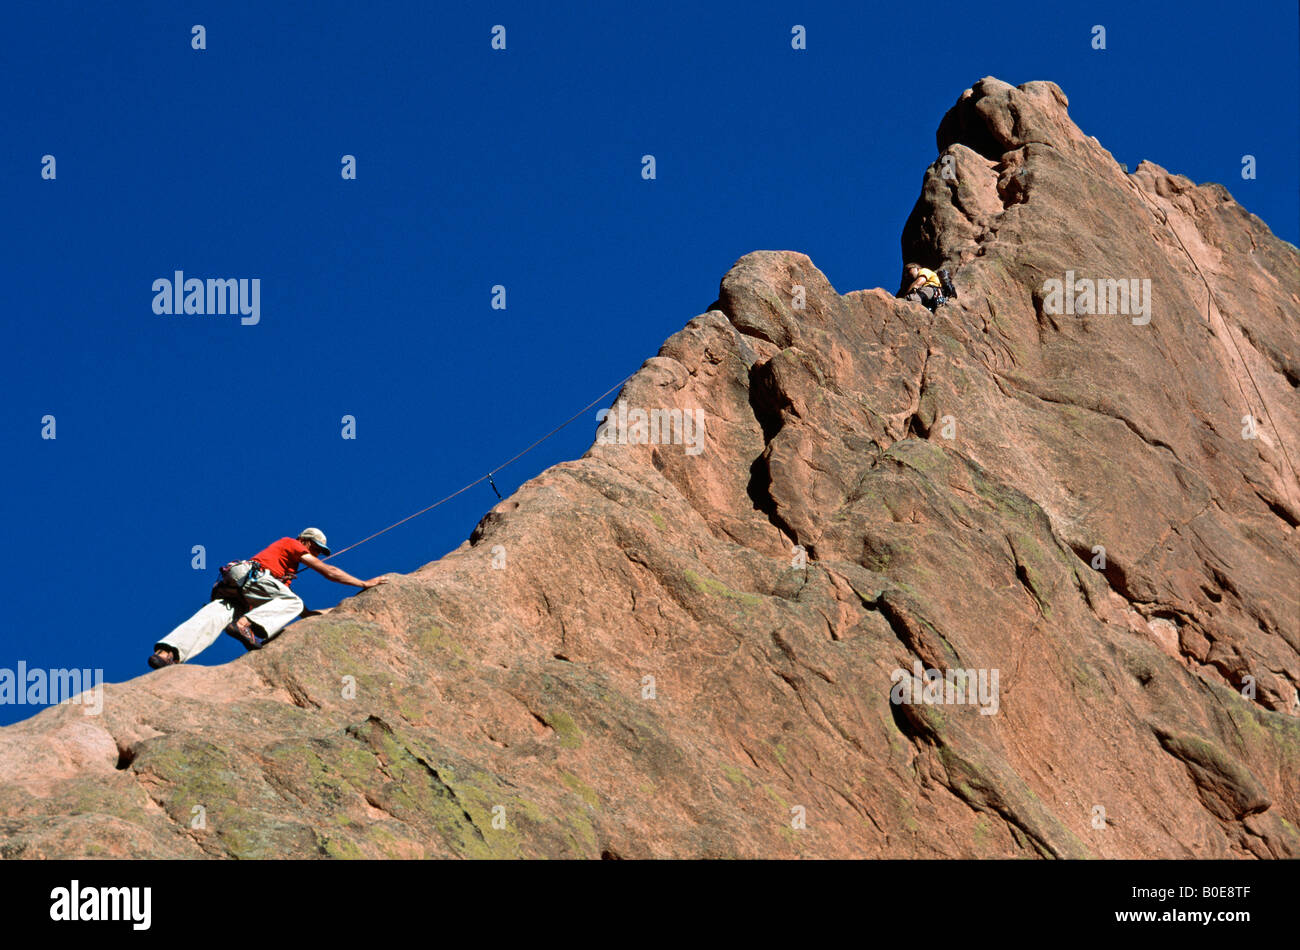 Rock climbers, Garden of the Gods Park, Colorado Springs, Colorado - Stock Image